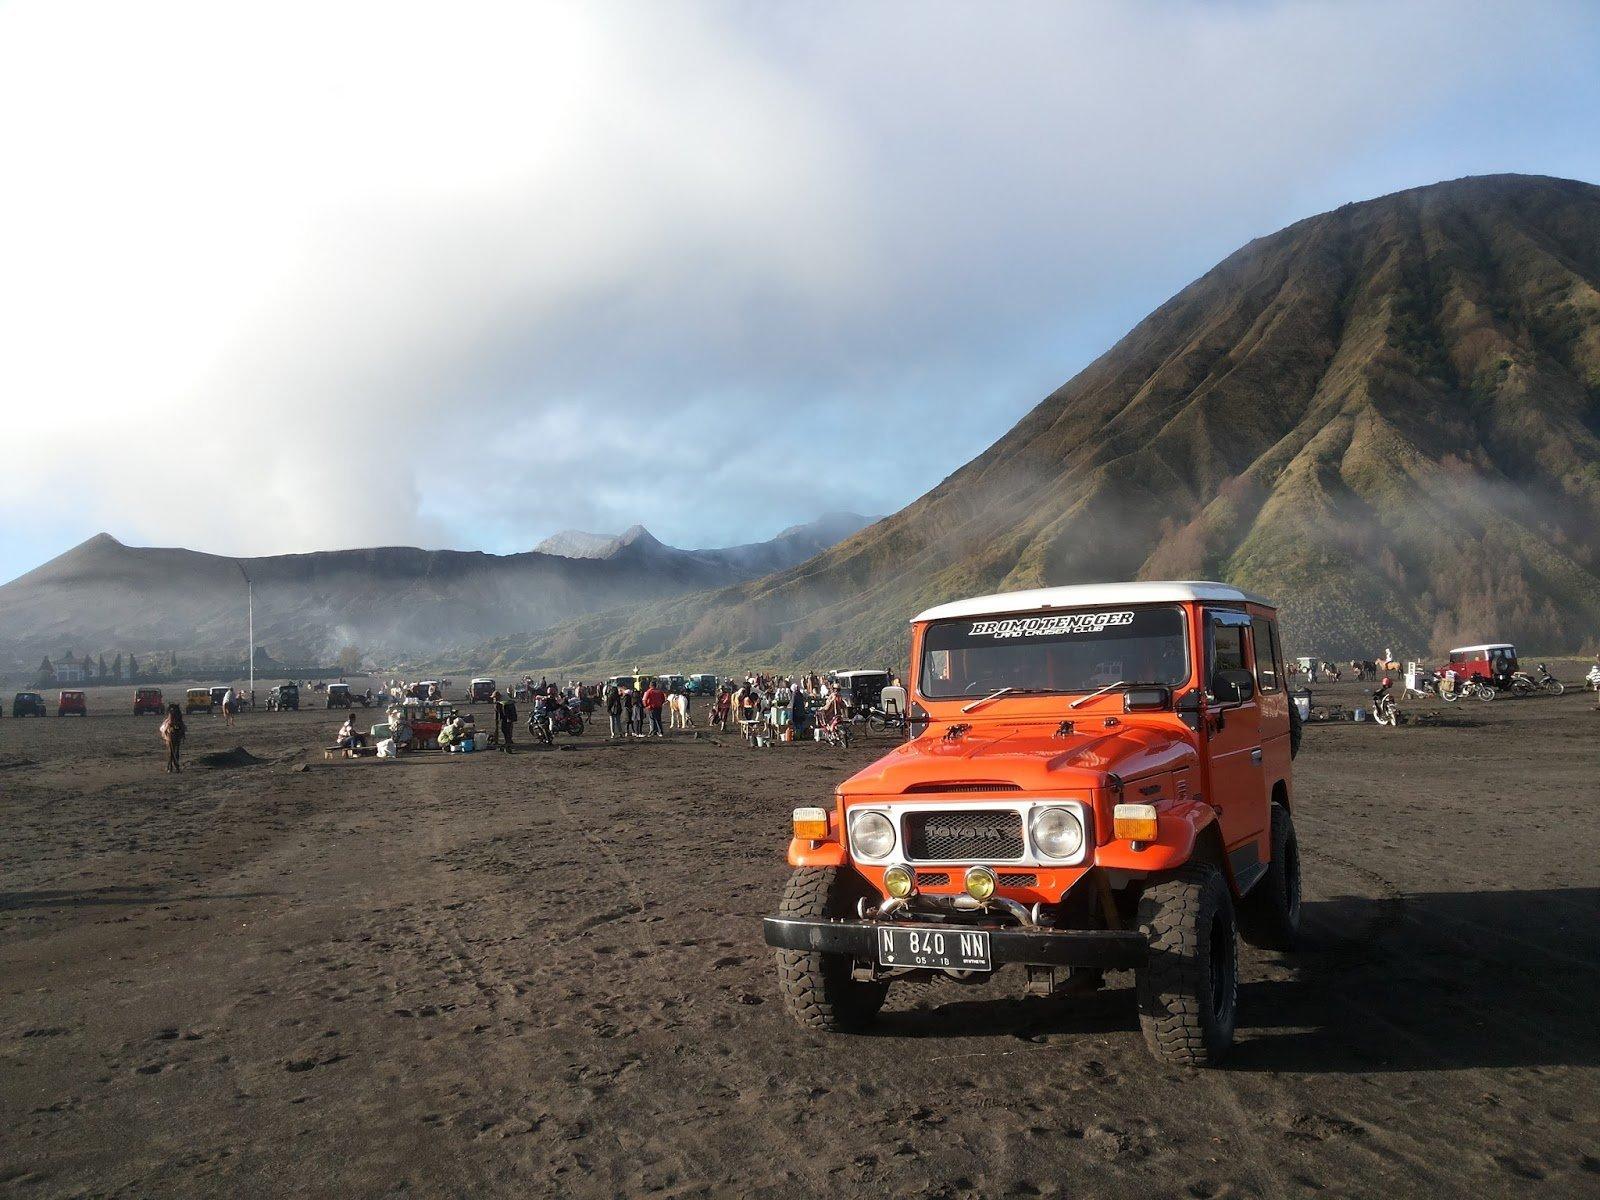 Mt Bromo Sunrise Tour Form Surabaya Or Malang Midnight Madakaripura 5